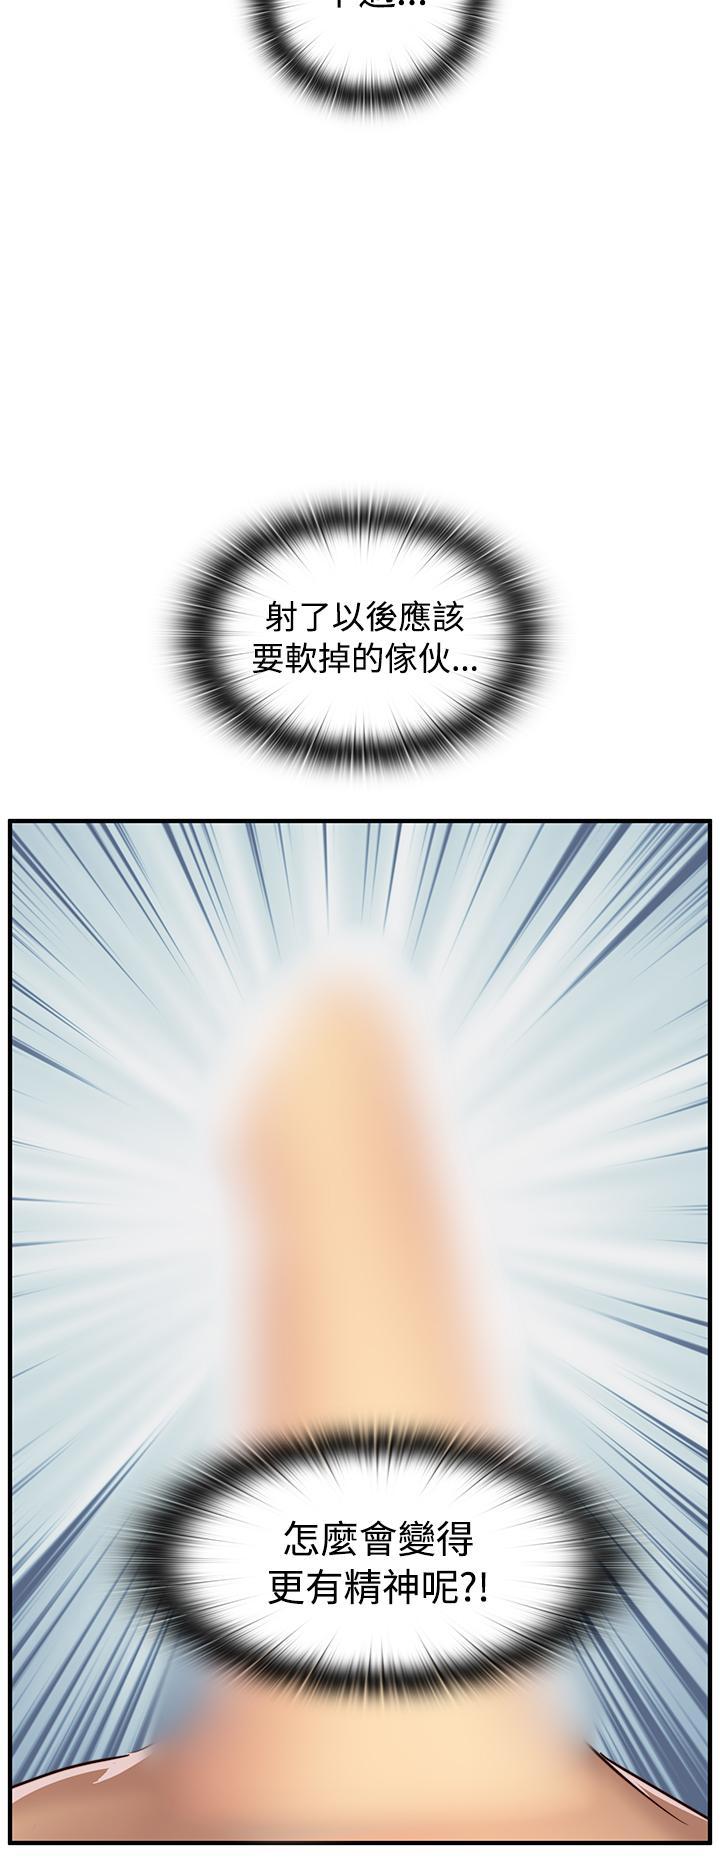 [Dasum & Puutaro] H-Campus H校园<第2季> ch.41-46 (chinese) 31